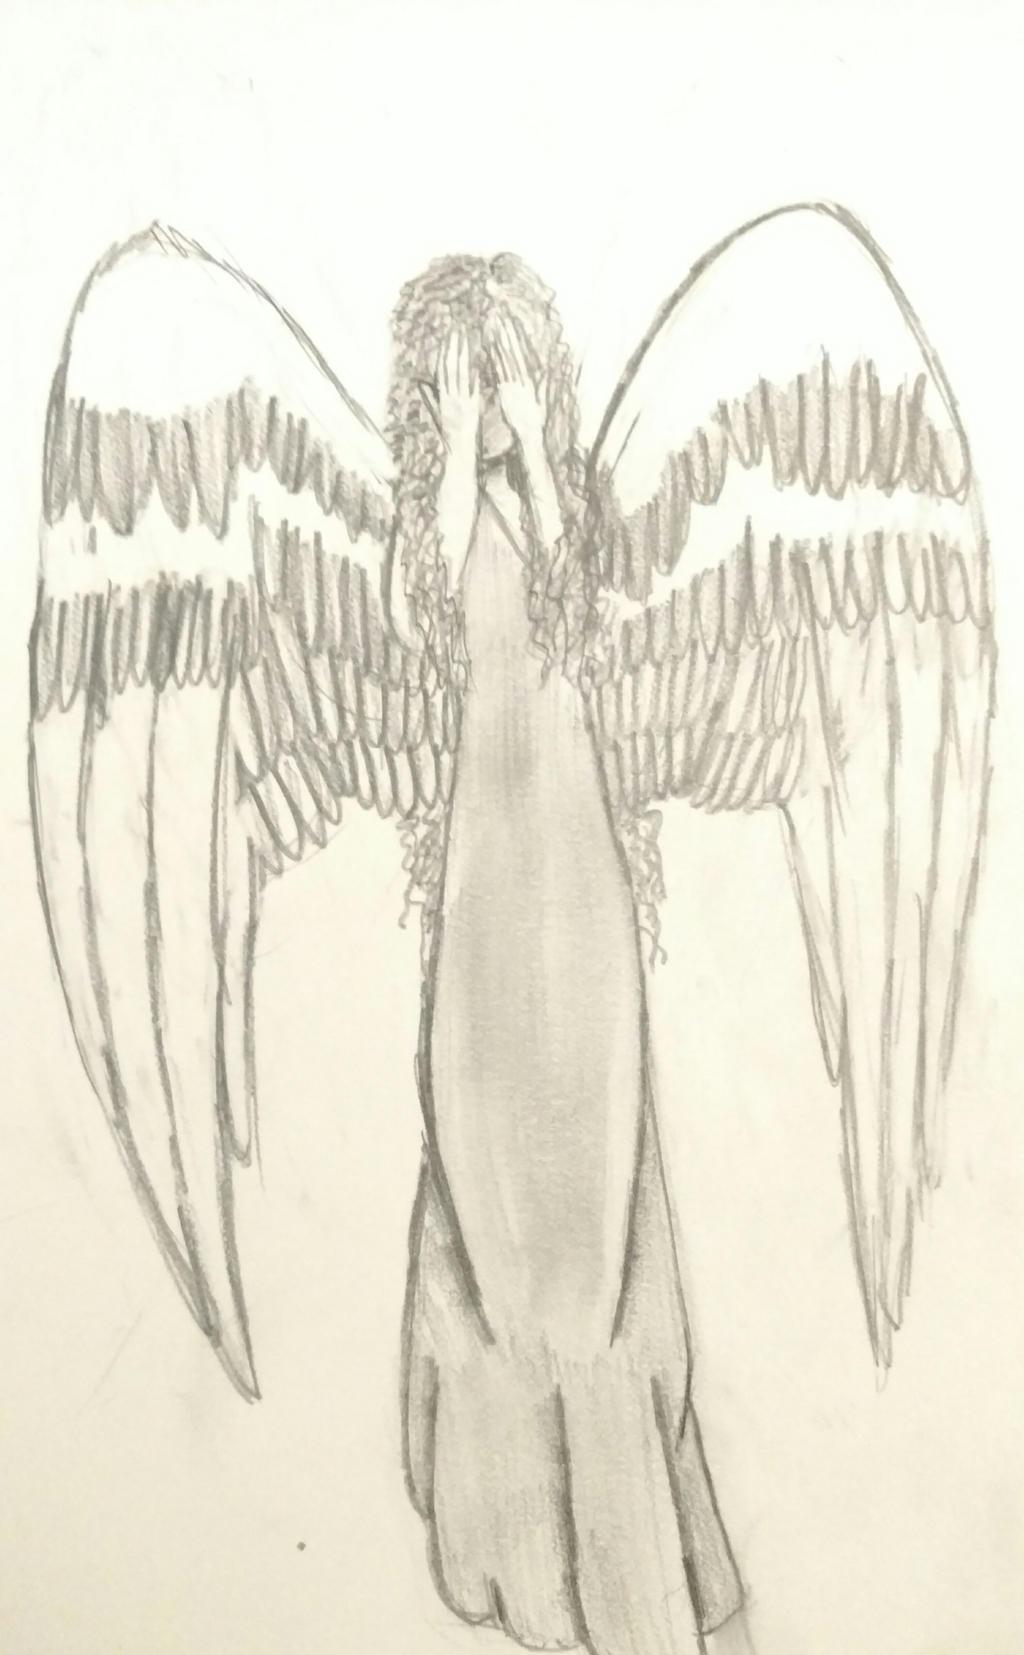 The Crying Angel by wolf-karpova